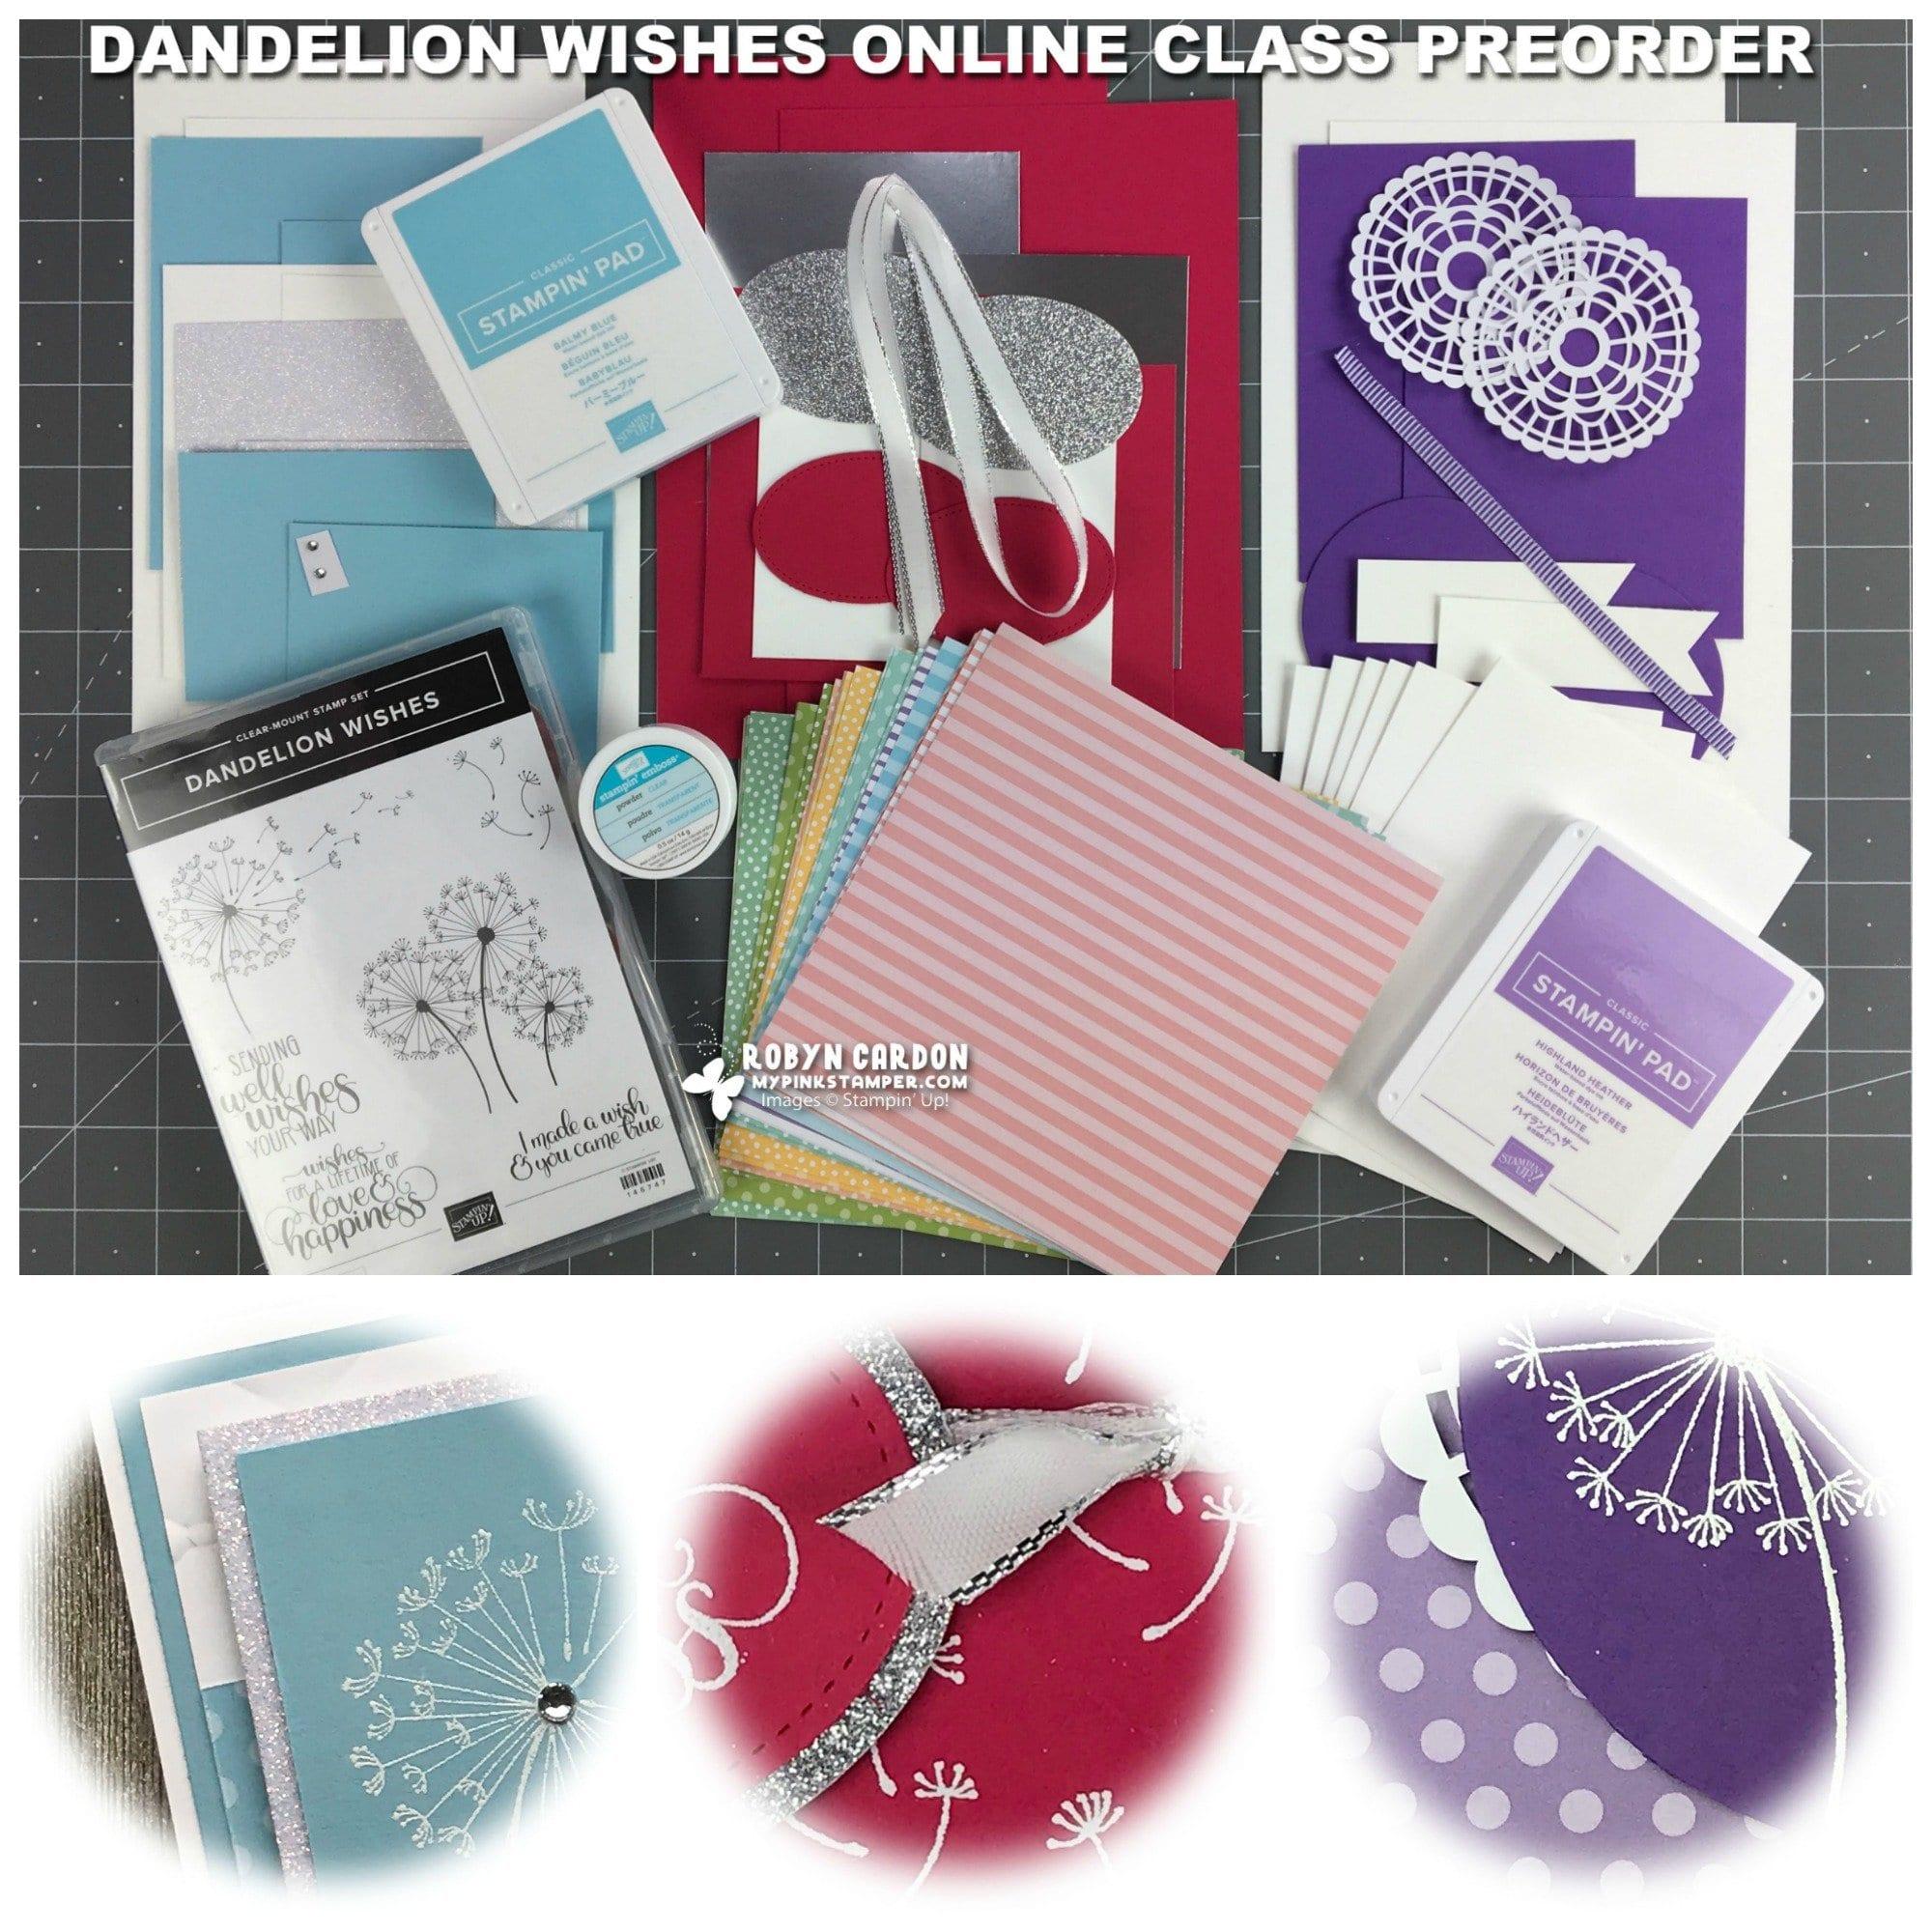 Dandelion Wishes Online Class Preorder